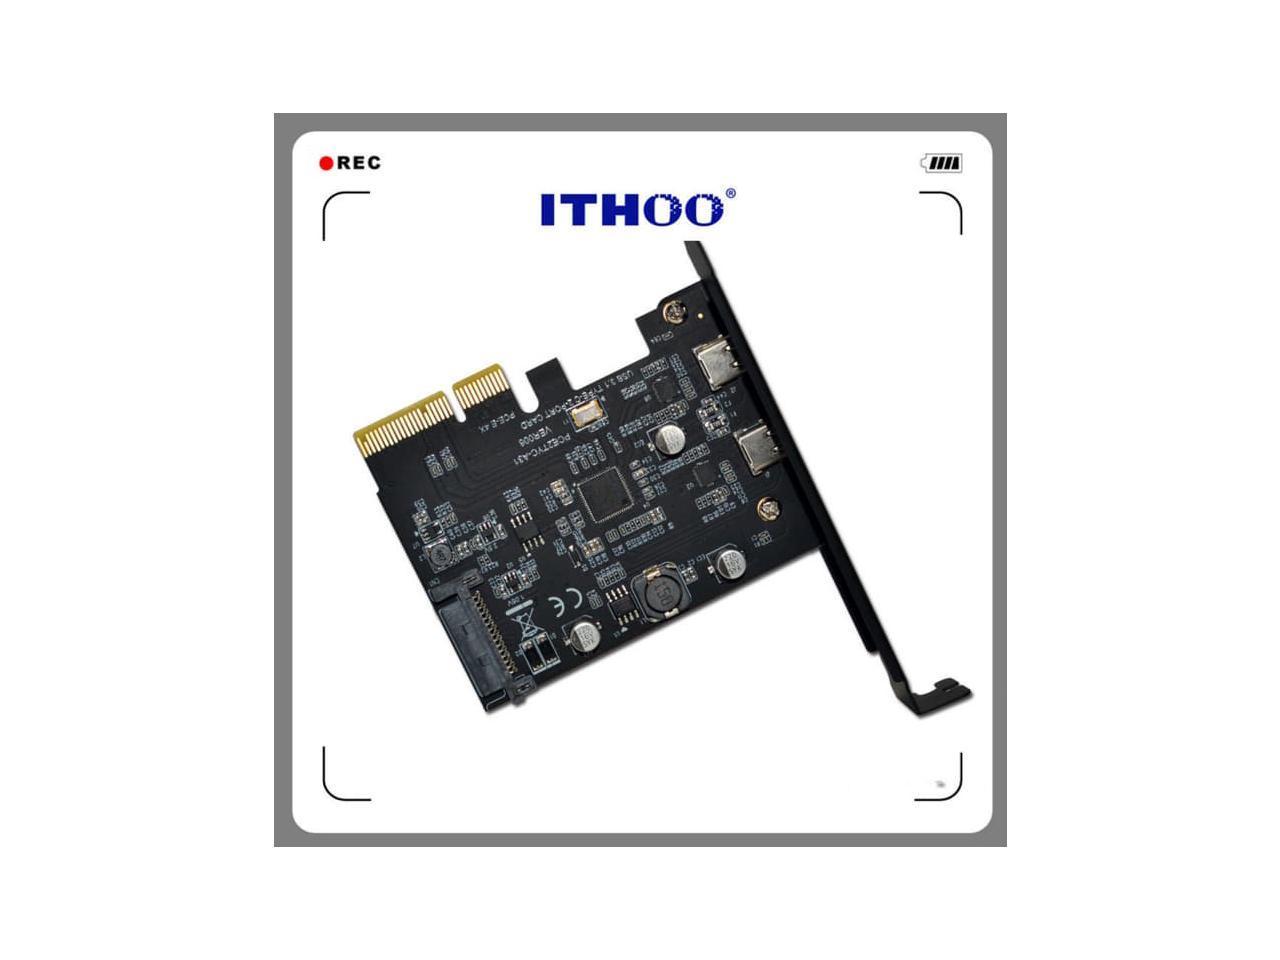 Tamppkon Dual Port Usb C Card 2x Usb C Usb 3 1 Pci E